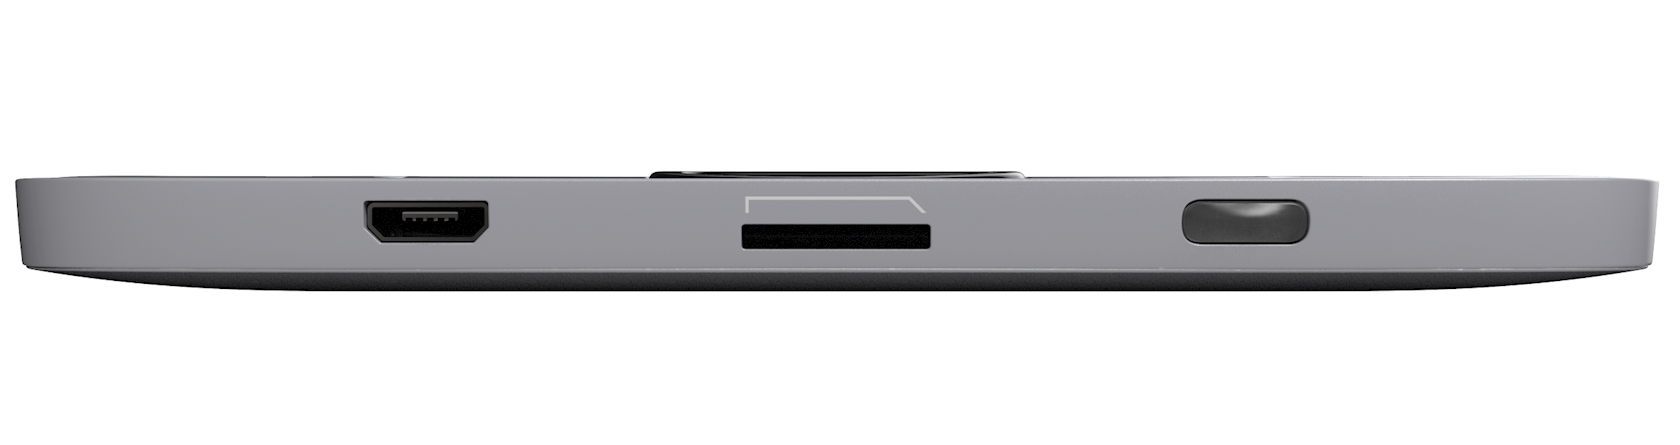 Elektron kitab PocketBook 616 Silver